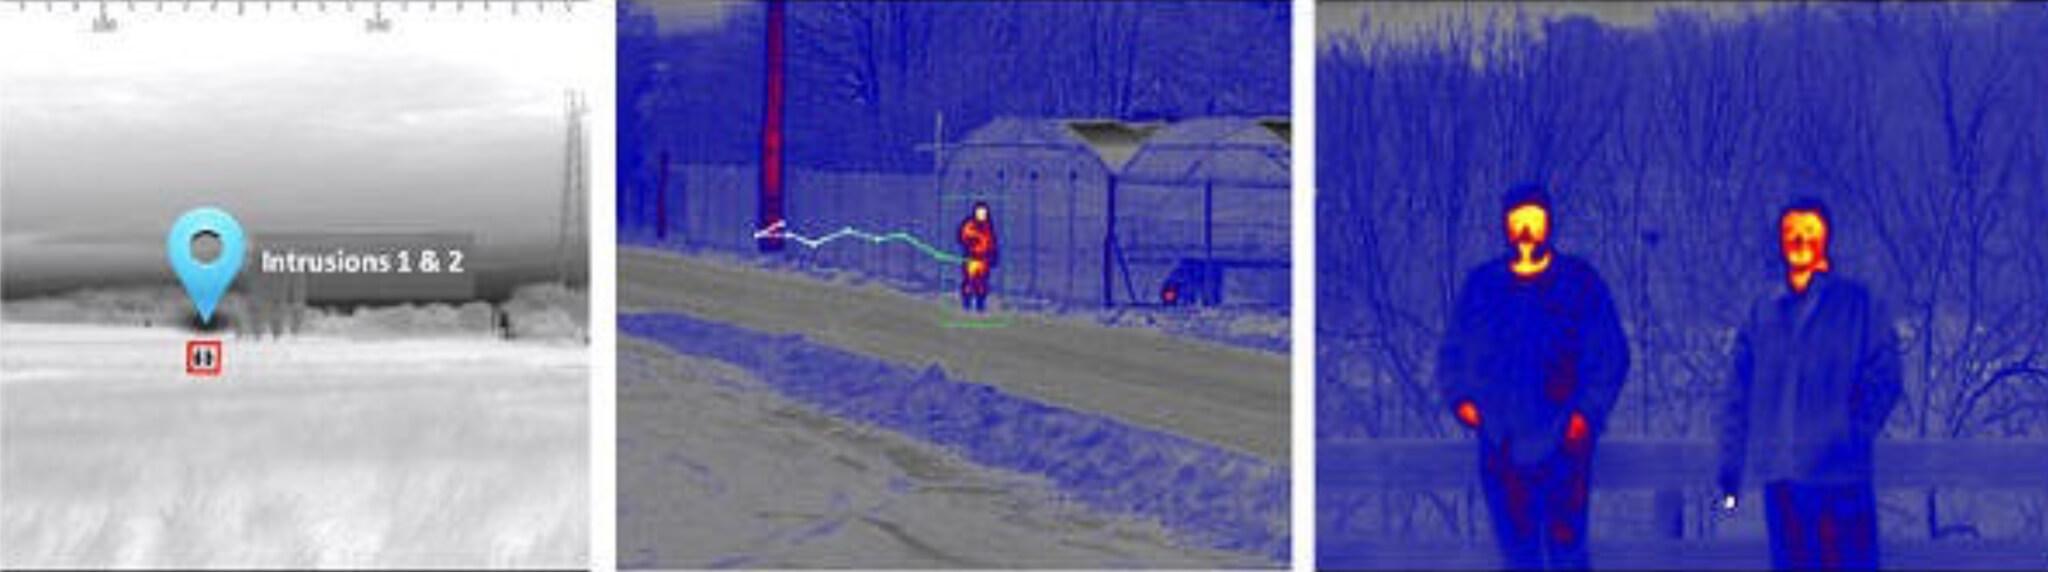 Thermal cameras in DRI